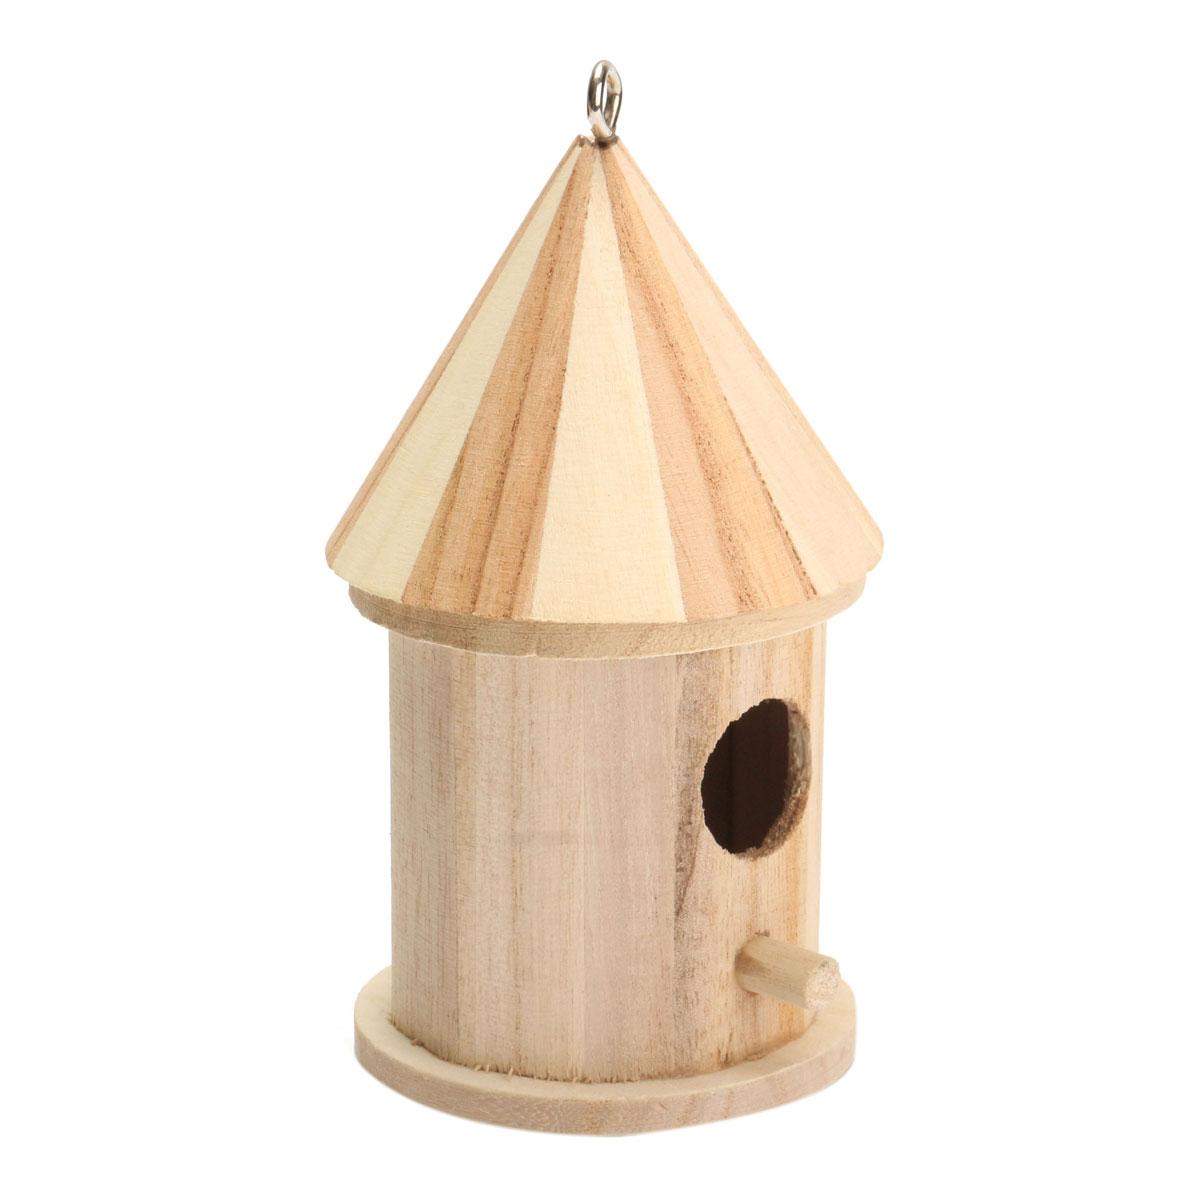 New Wooden Bird House Birdhouse Hanging Nest Nesting Box